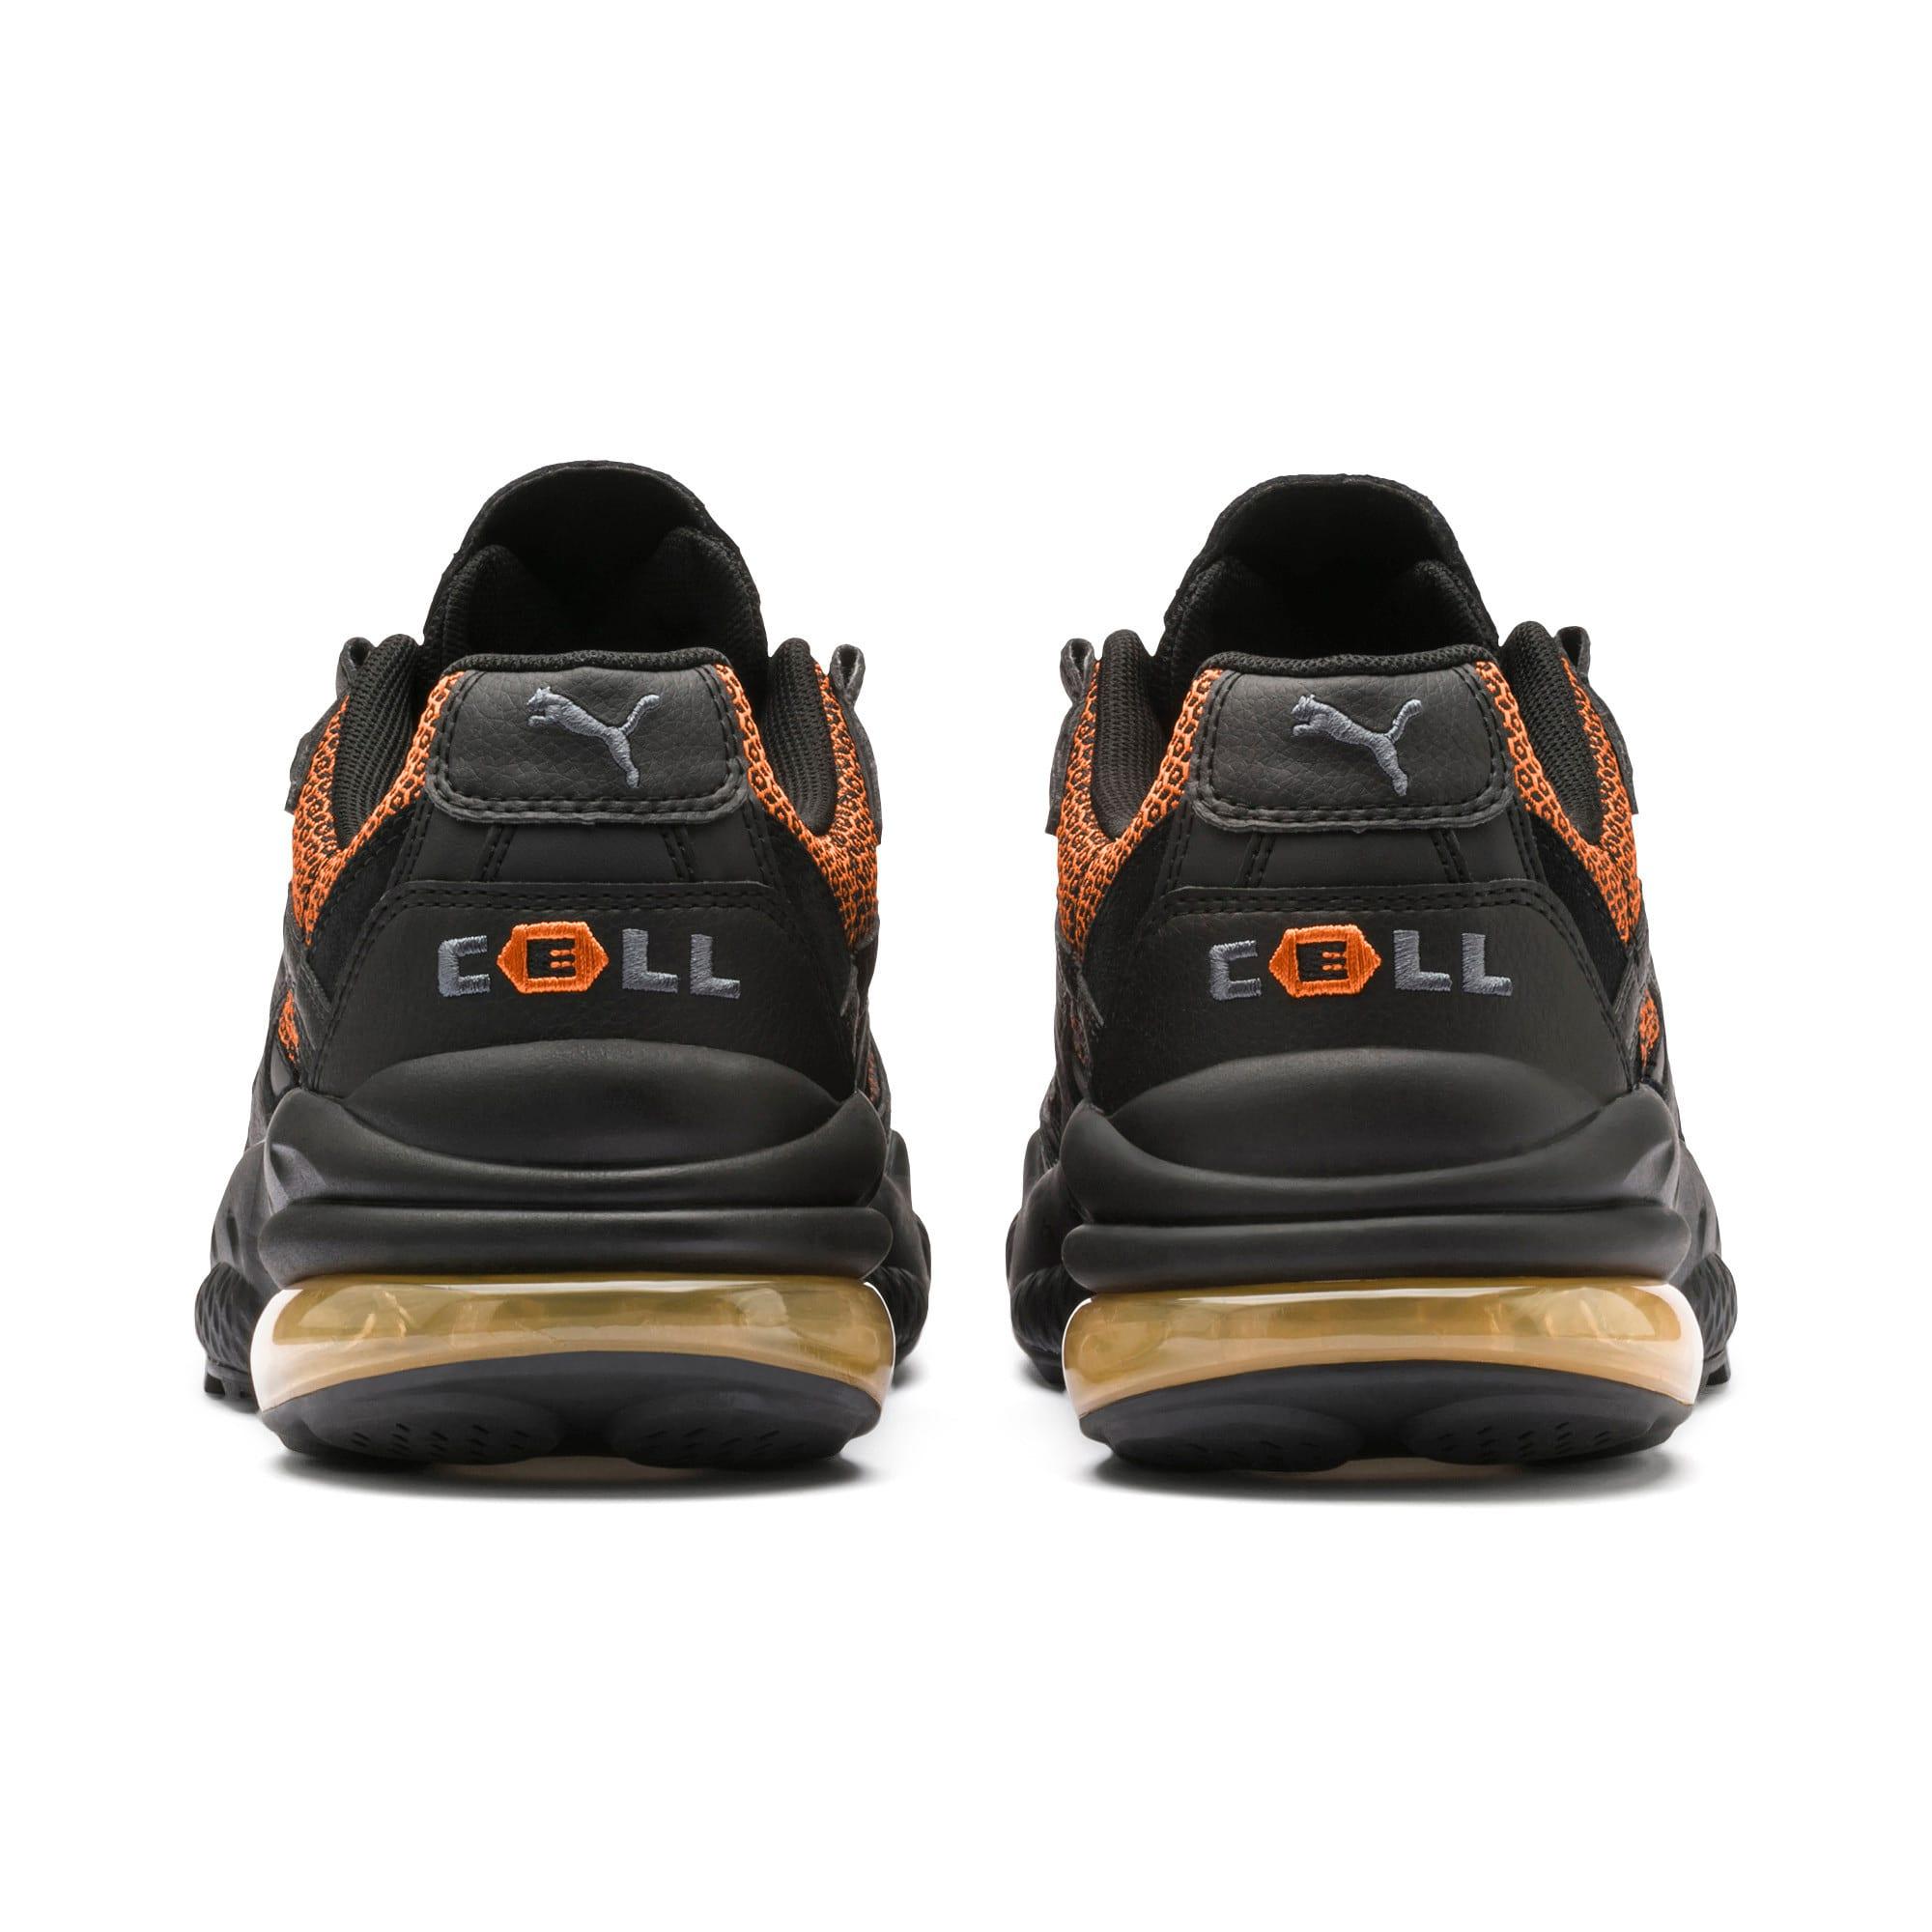 Thumbnail 4 of CELL Venom Lux Sneaker, Puma Black-Jaffa Orange, medium